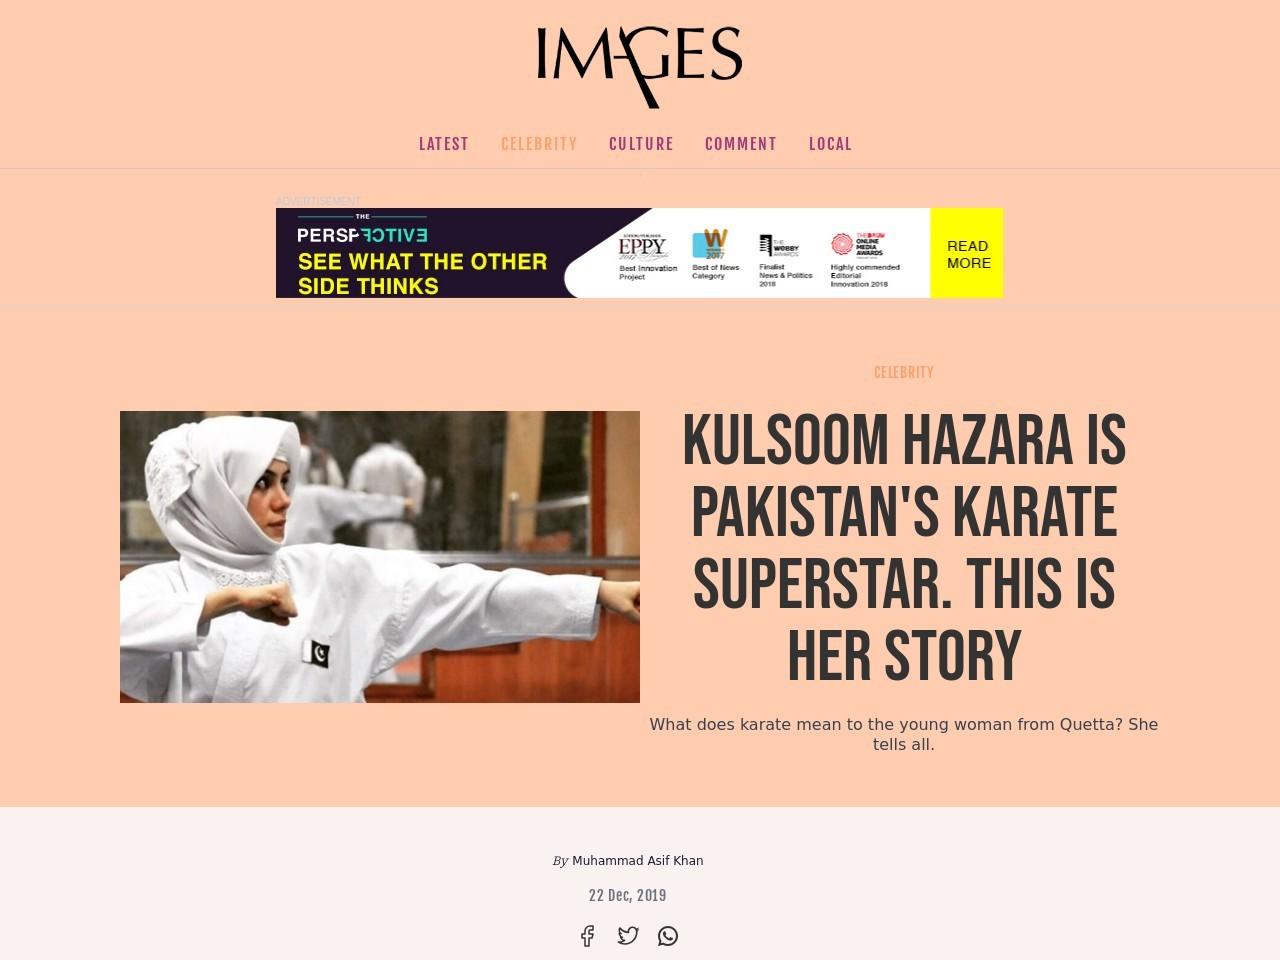 Kulsoom Hazara is Pakistan's karate superstar. This is her story